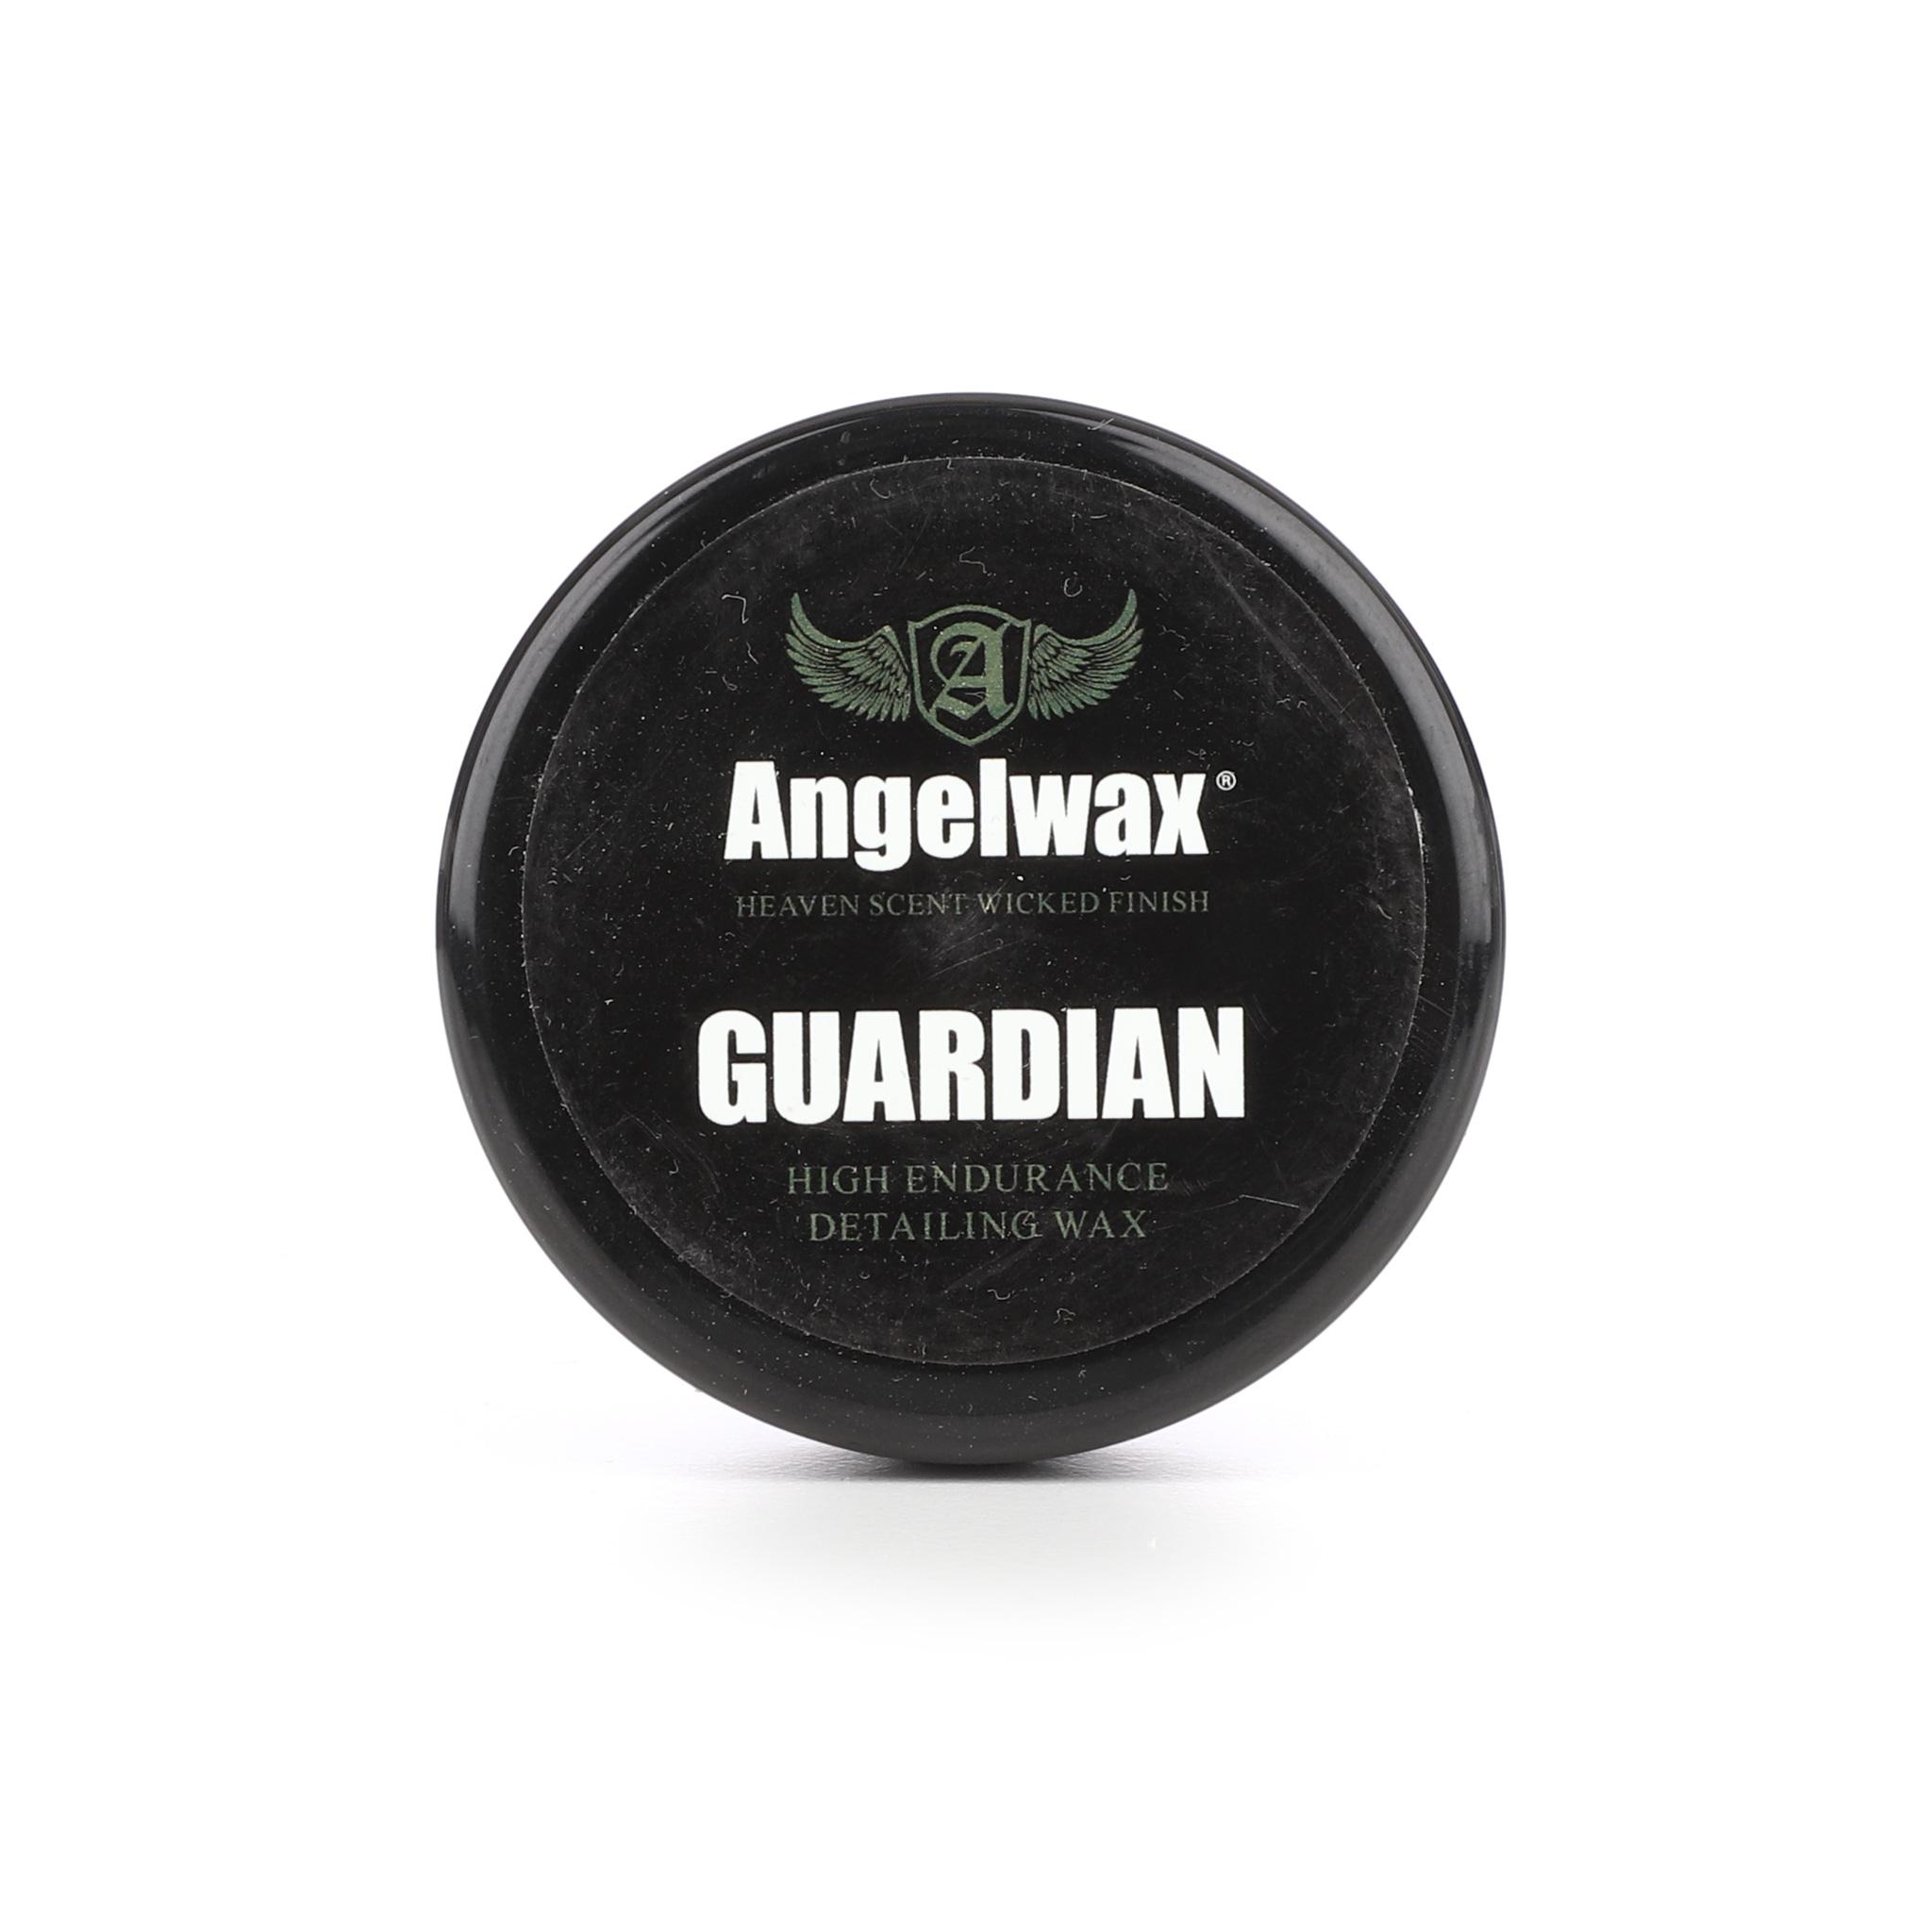 Bilvax Angelwax Guardian, 33 ml, Endast vax